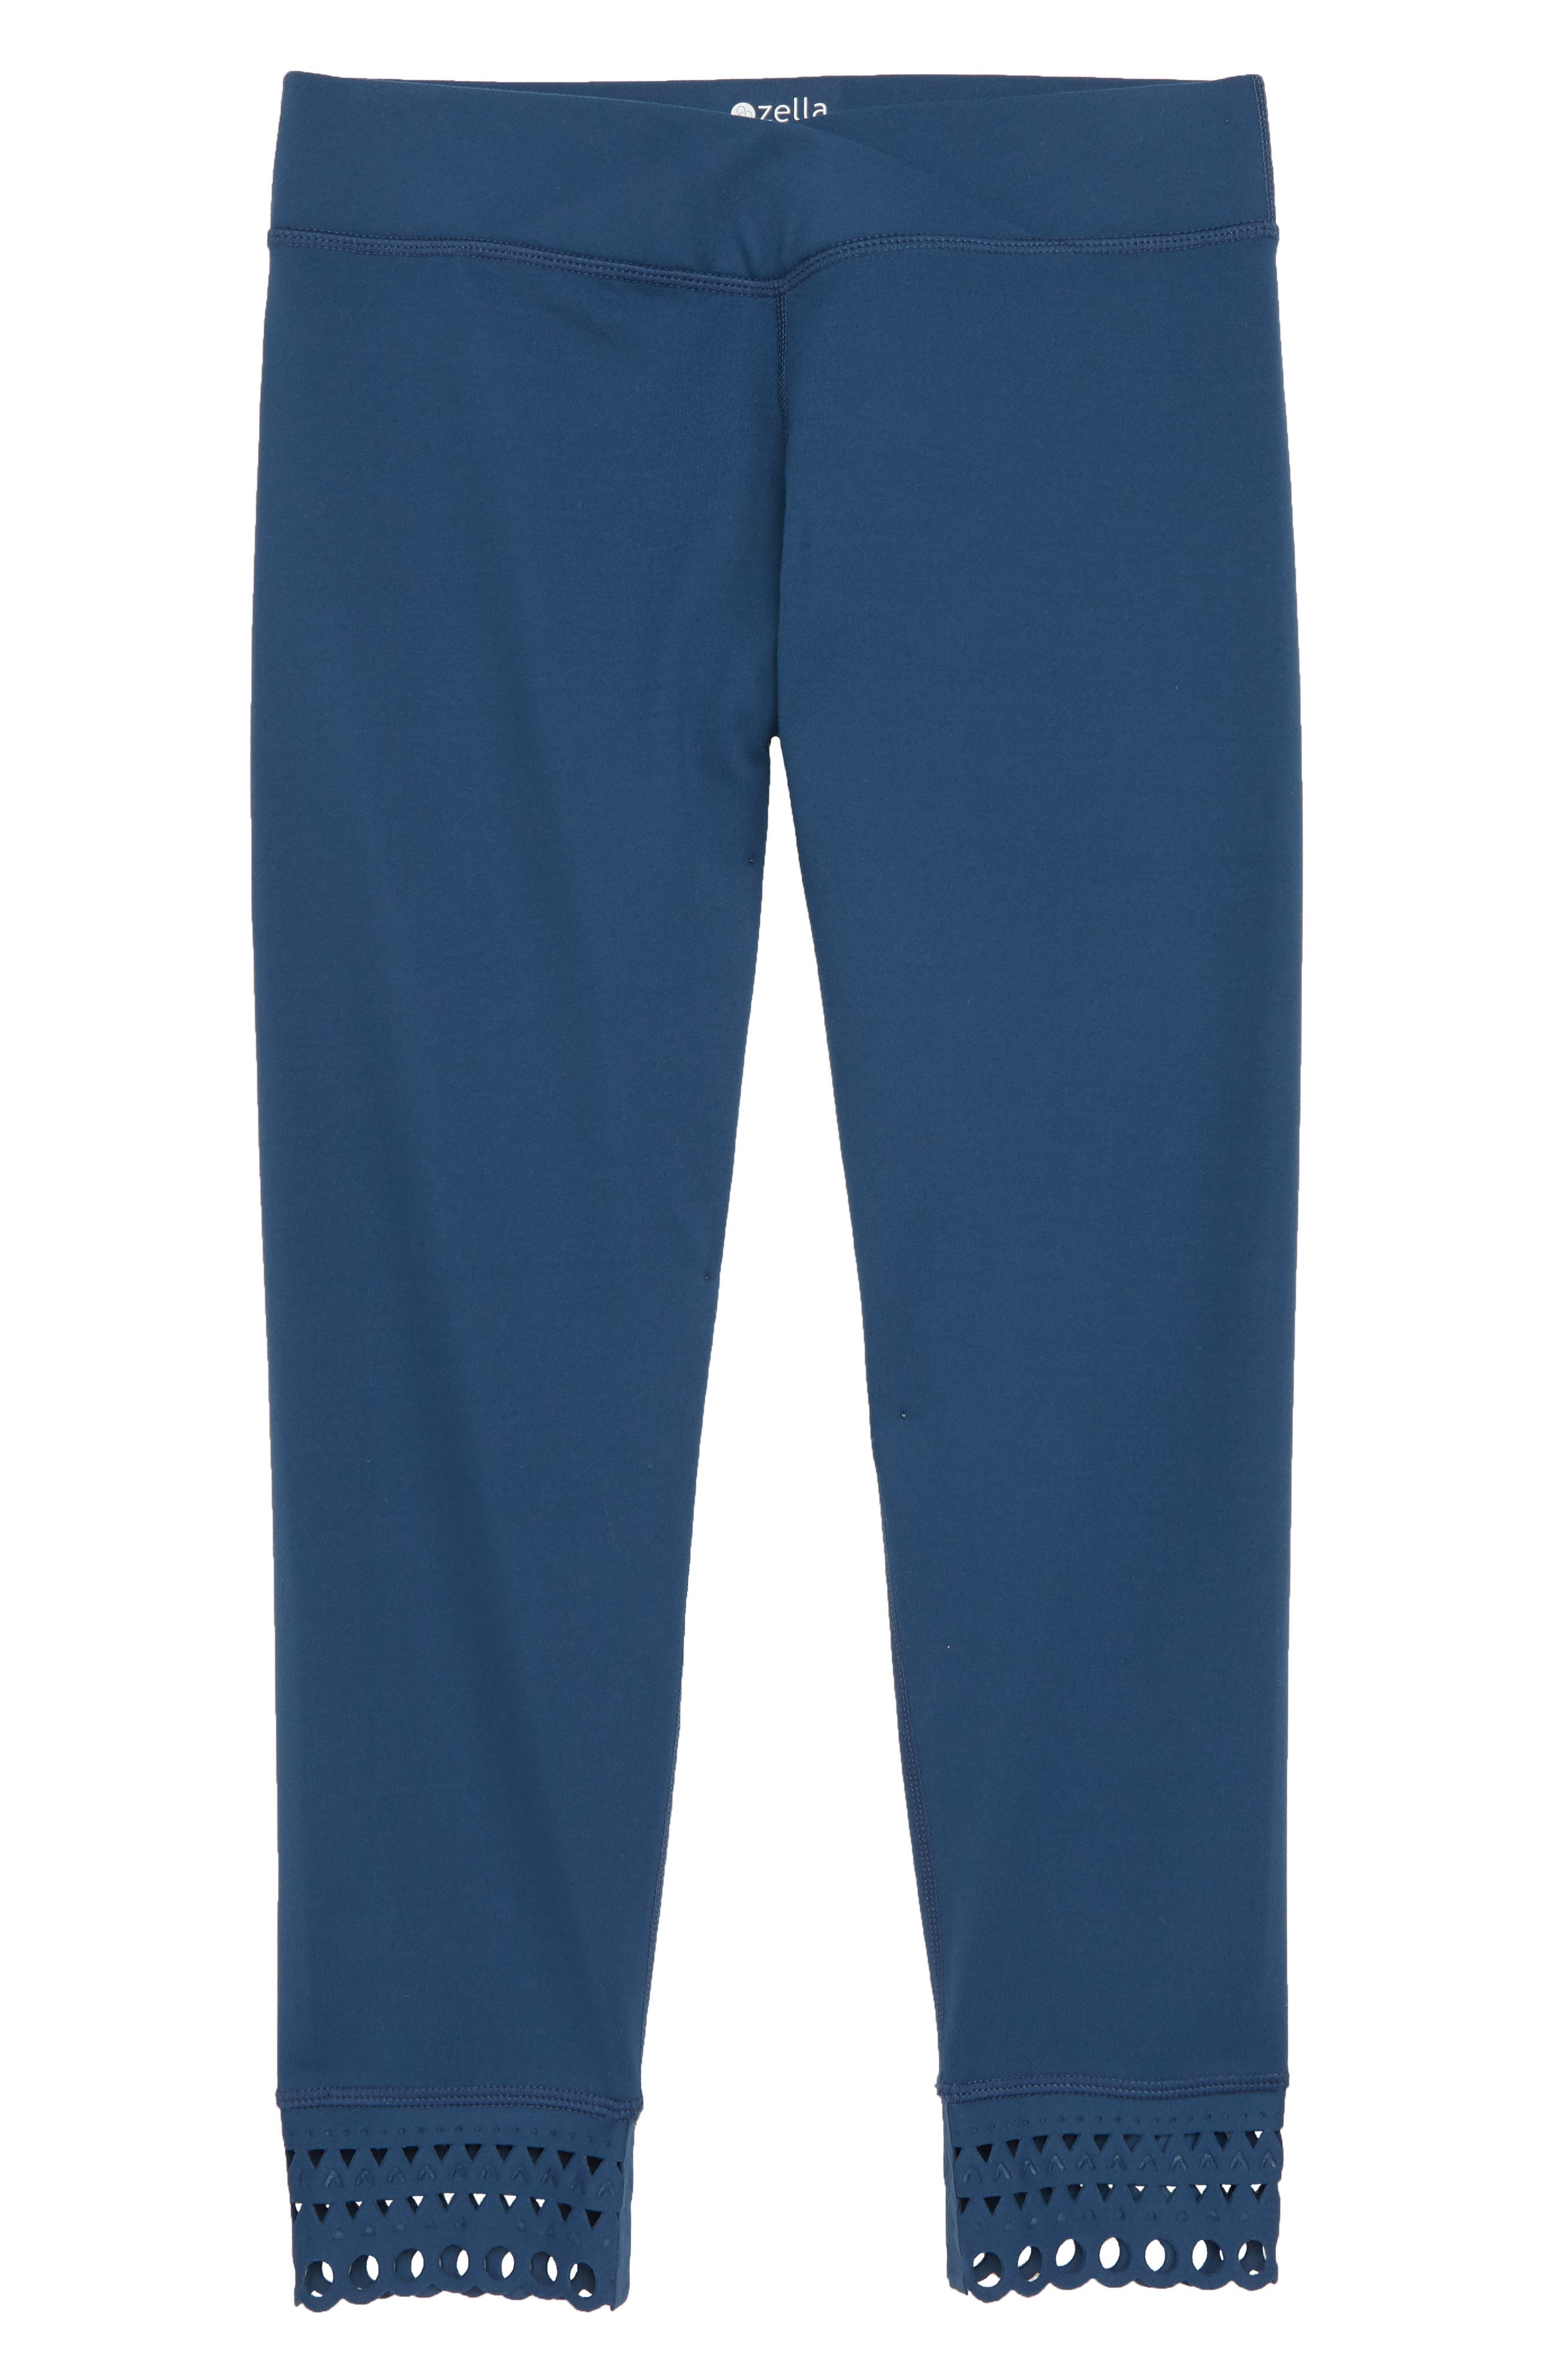 Laser Cut Crop Leggings,                             Main thumbnail 1, color,                             Blue Insignia